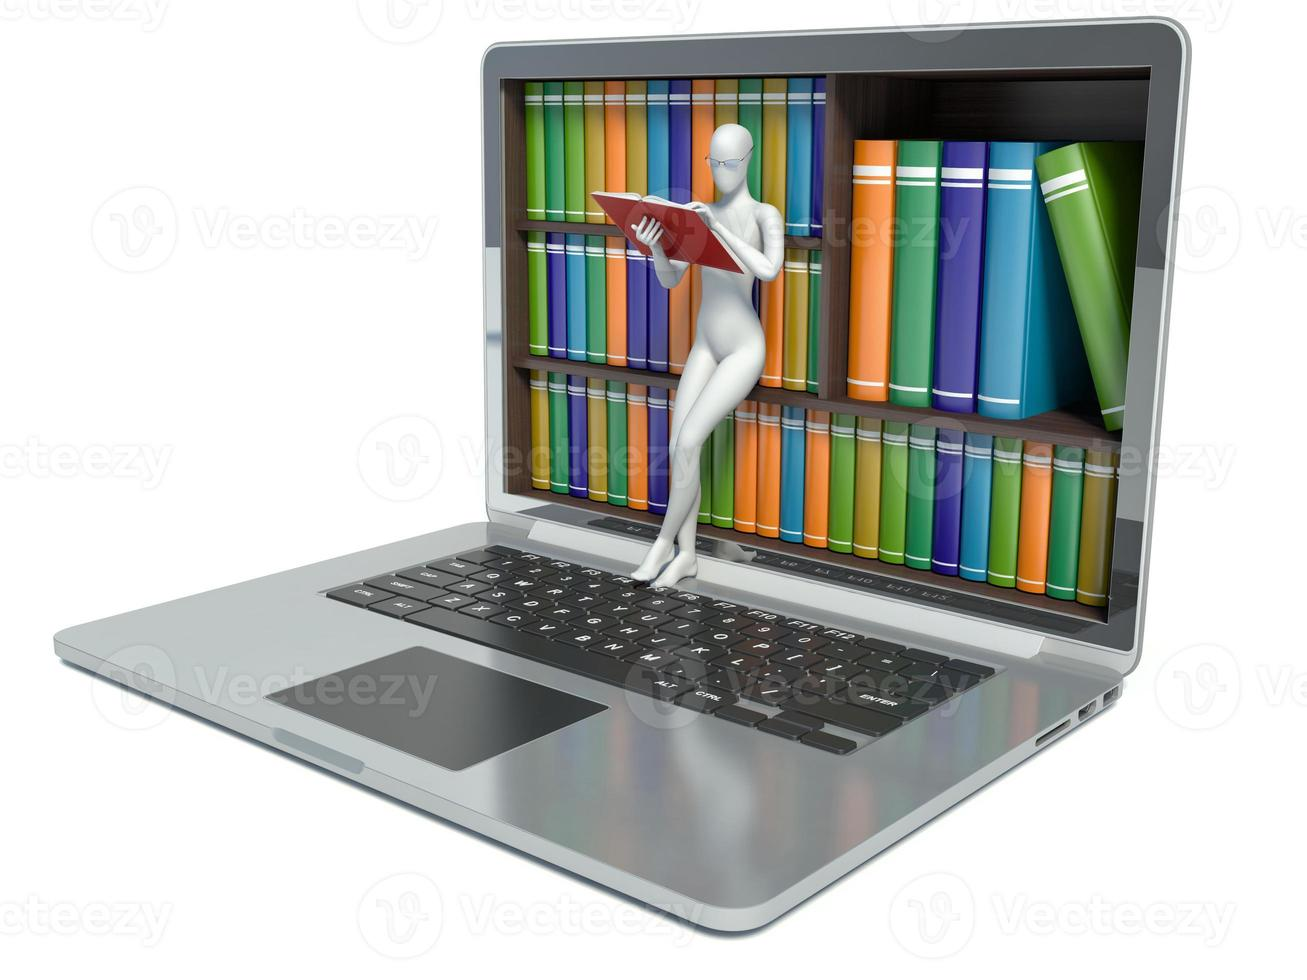 Vita människor 3d. ny teknik. digitalt bibliotek koncept. LAPT foto